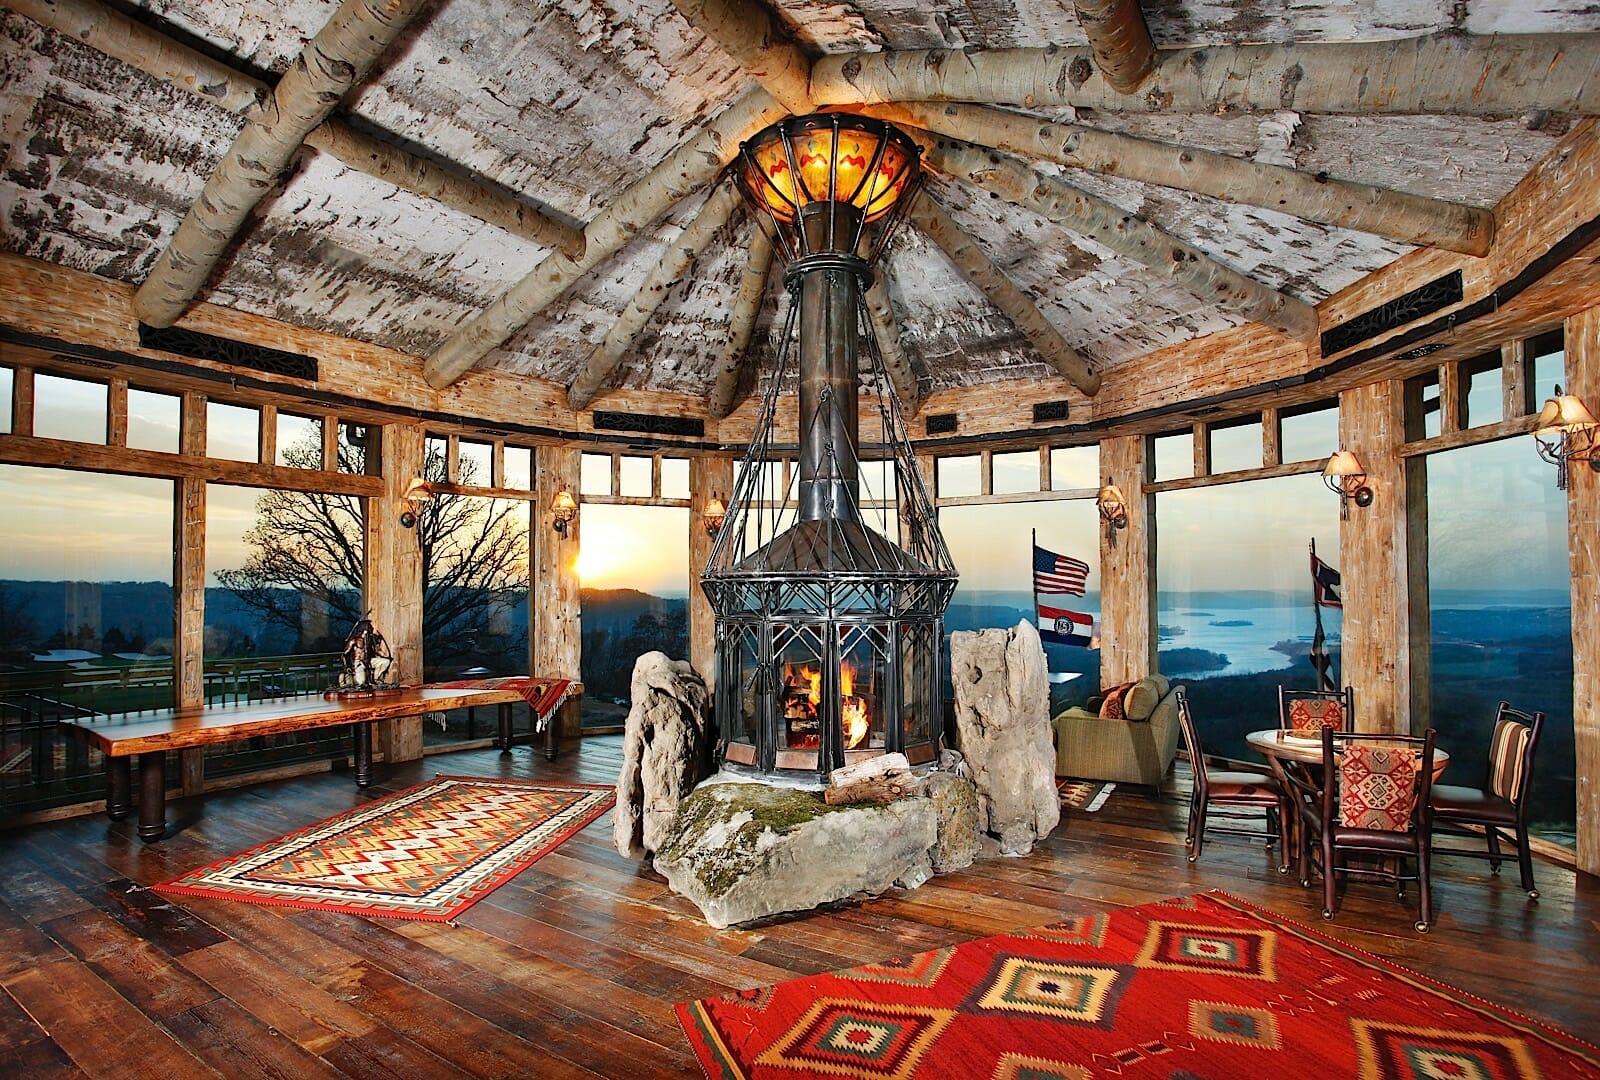 Romantic Wooden Architecture Romantic Getaway Spots